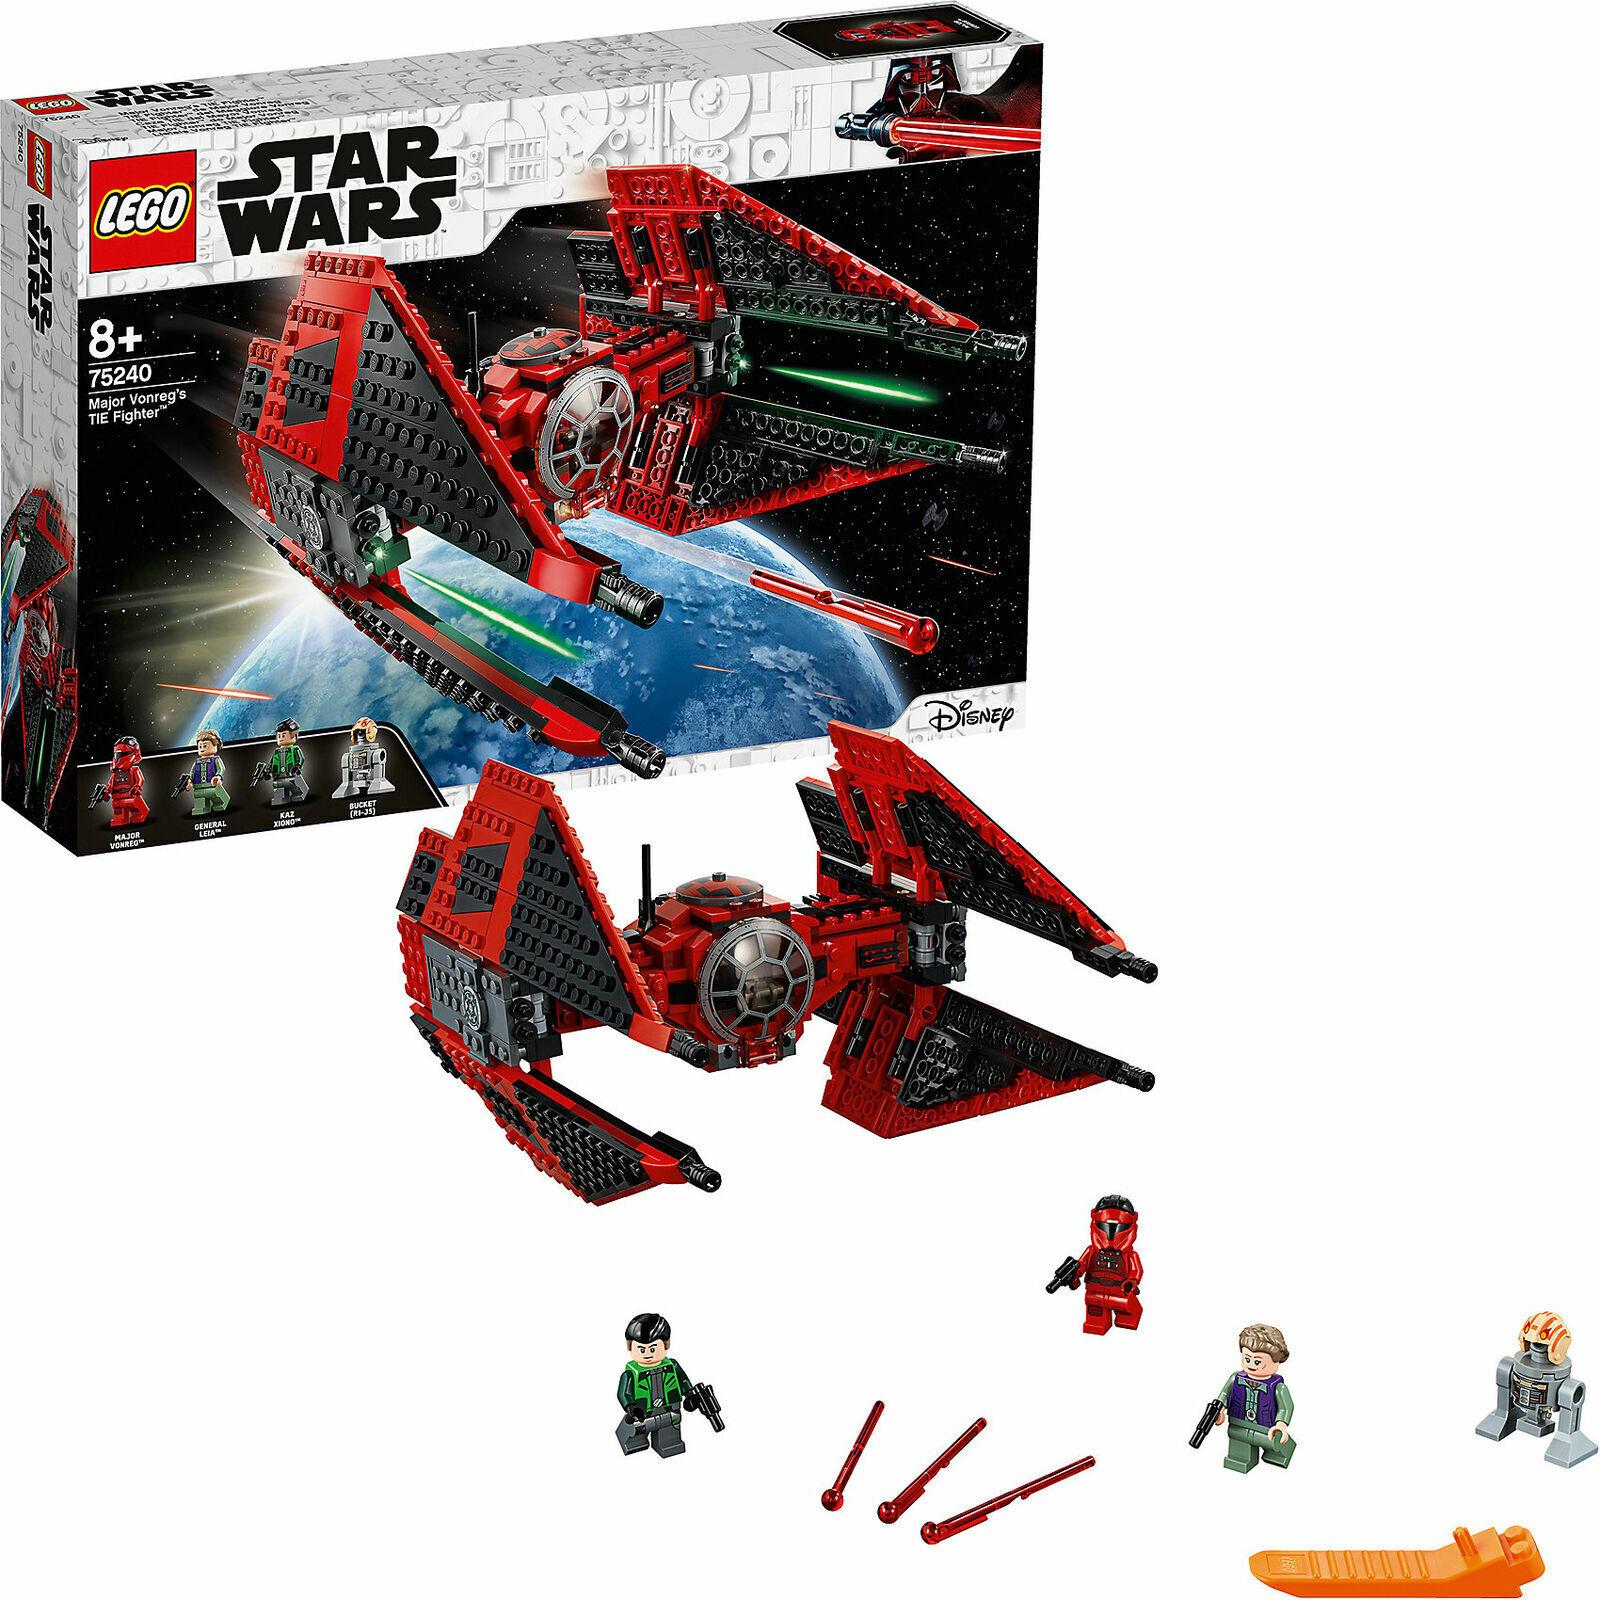 LEGO ® Star Wars ™ 75240-Major vonreg'S TIE FIGHTER ™ - 496 parti NUOVO & OVP